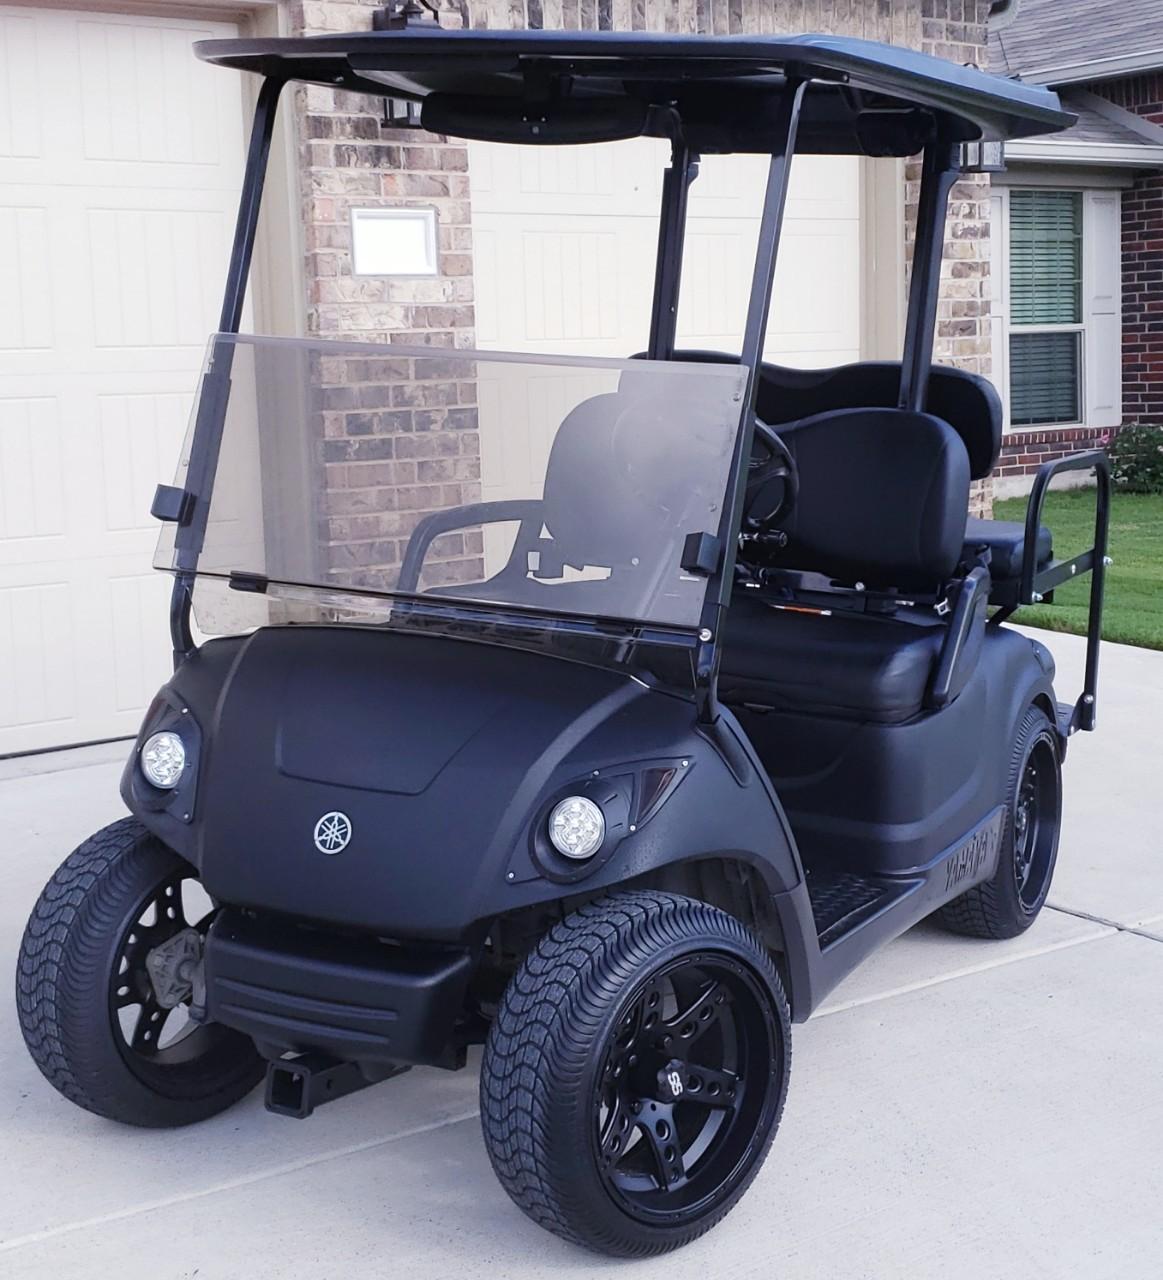 Yamaha For Sale - Yamaha Golf Carts ATVs - ATV Trader